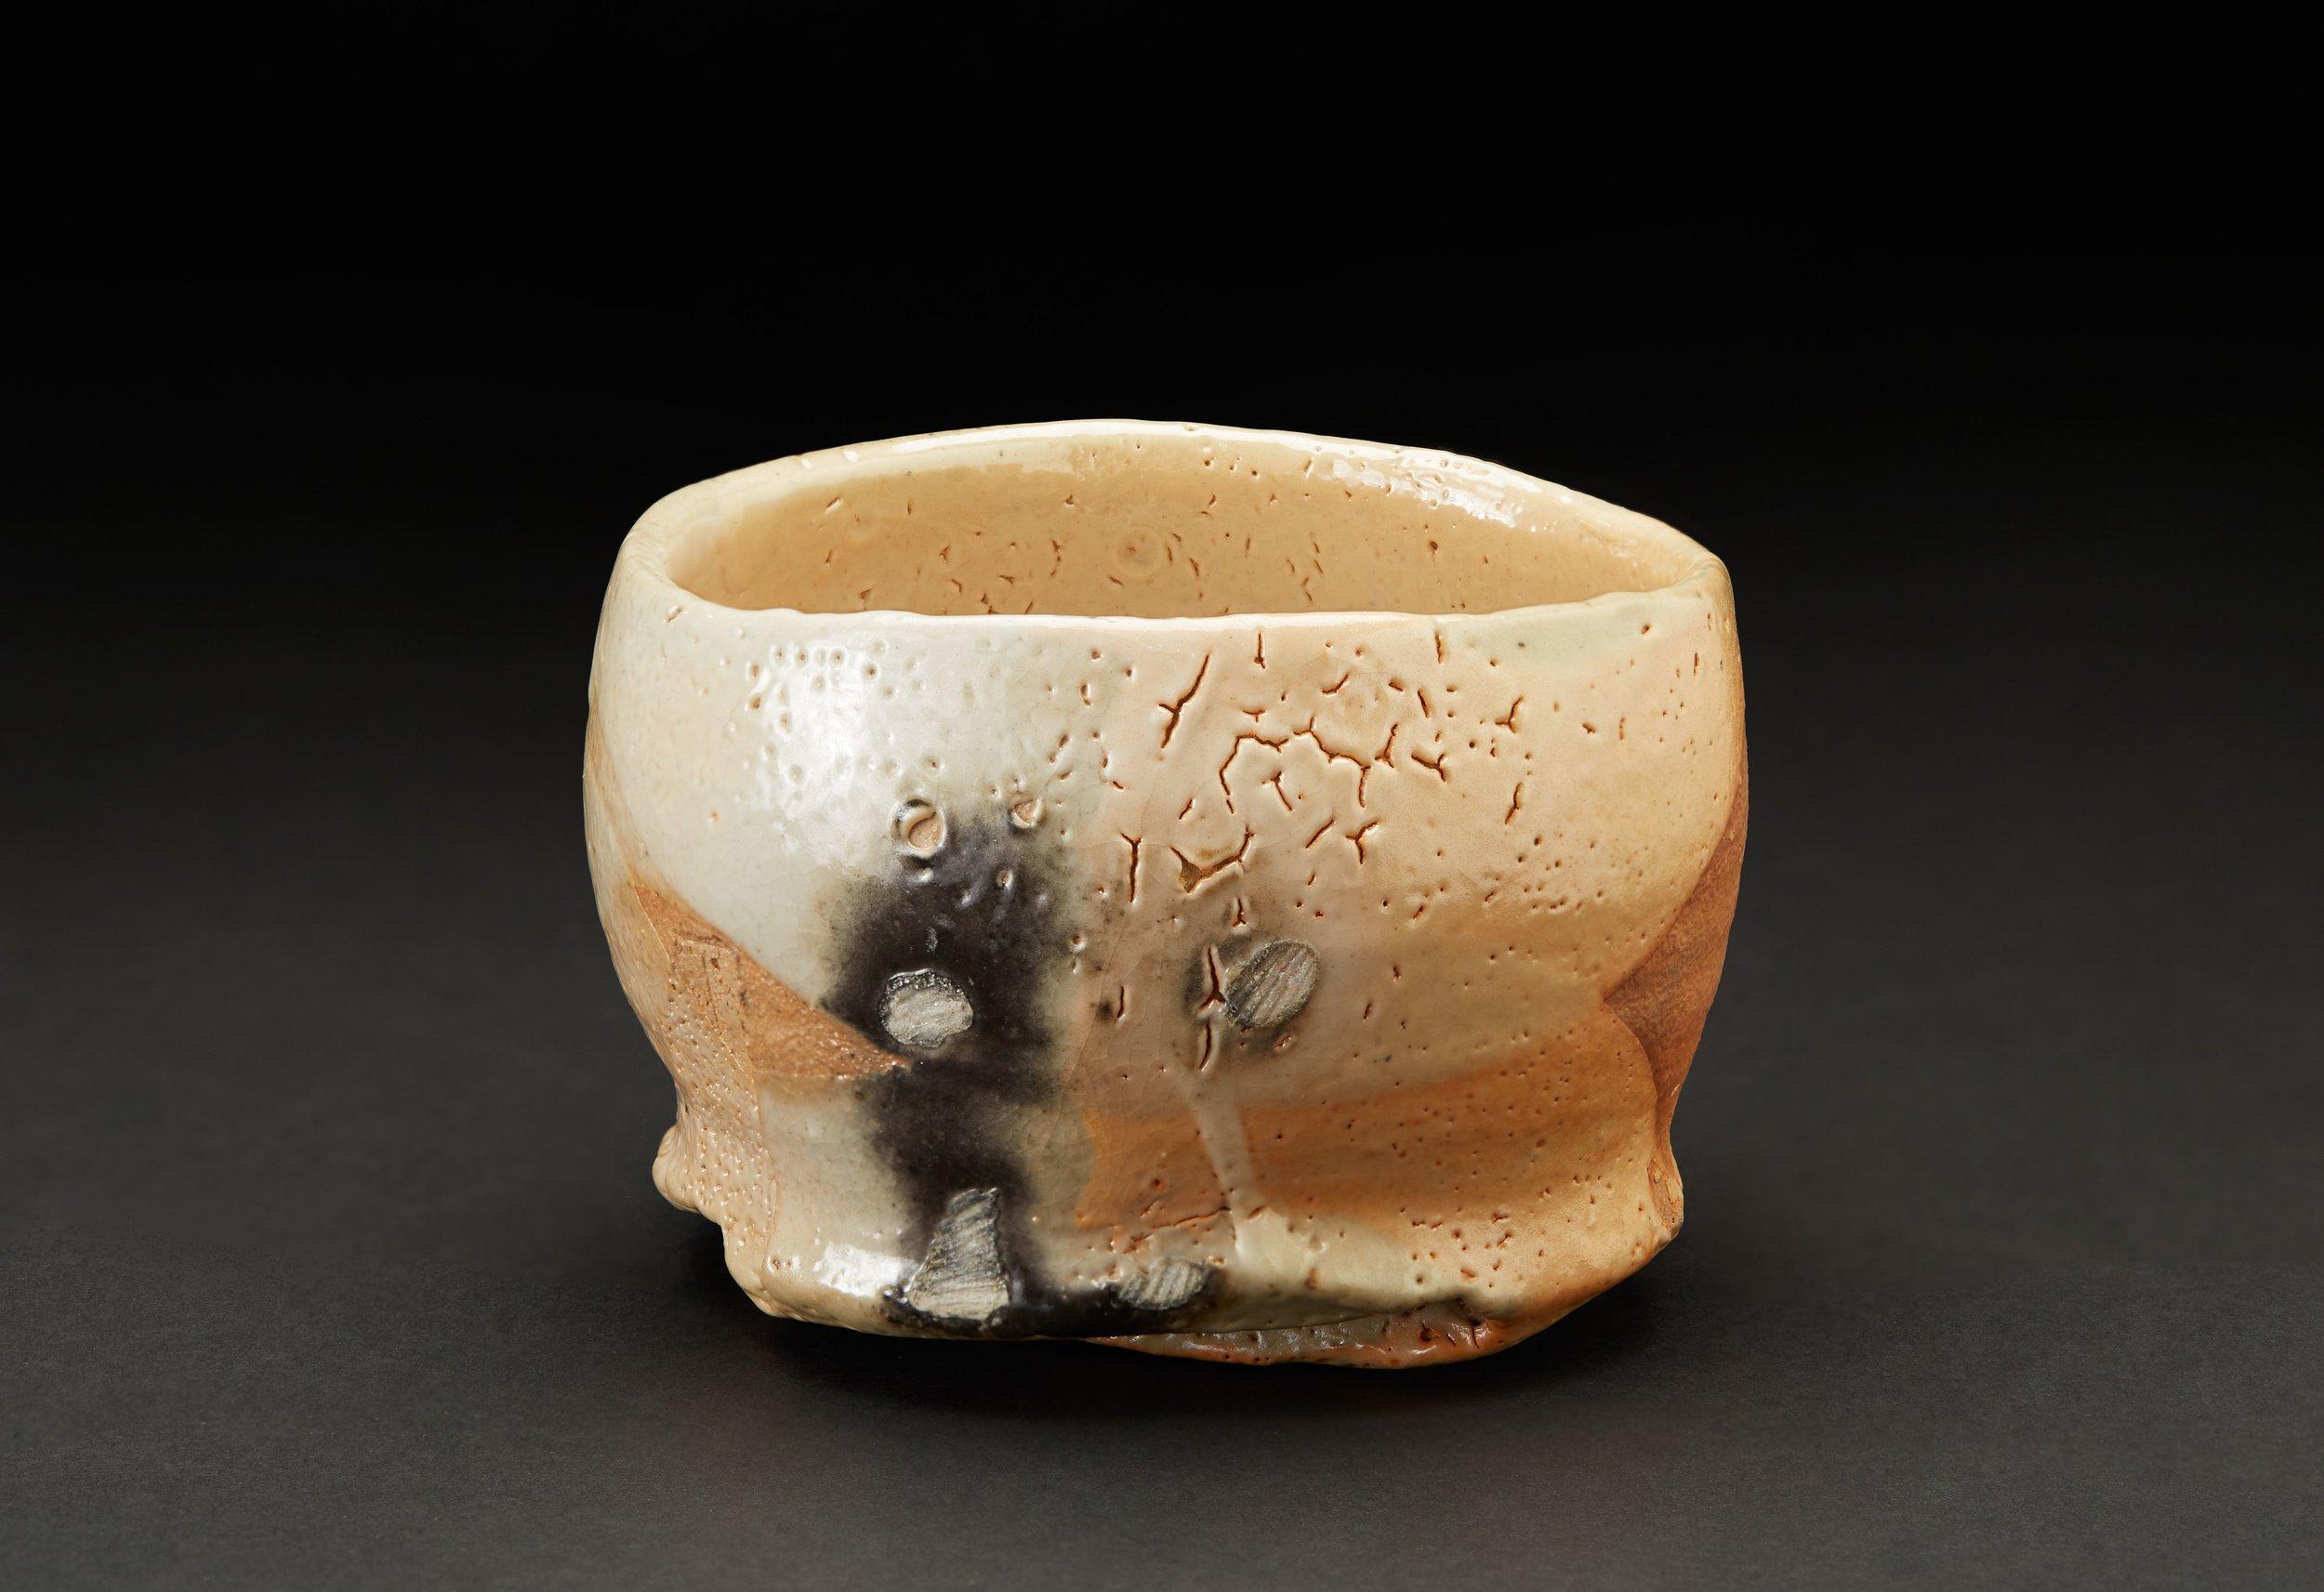 Jeff Shapiro    Chawan  , 2008 Woodfired Ceramic 4.75 x 4.5 x 3 inches 12.1 x 11.4 x 7.6 cm JSh 29